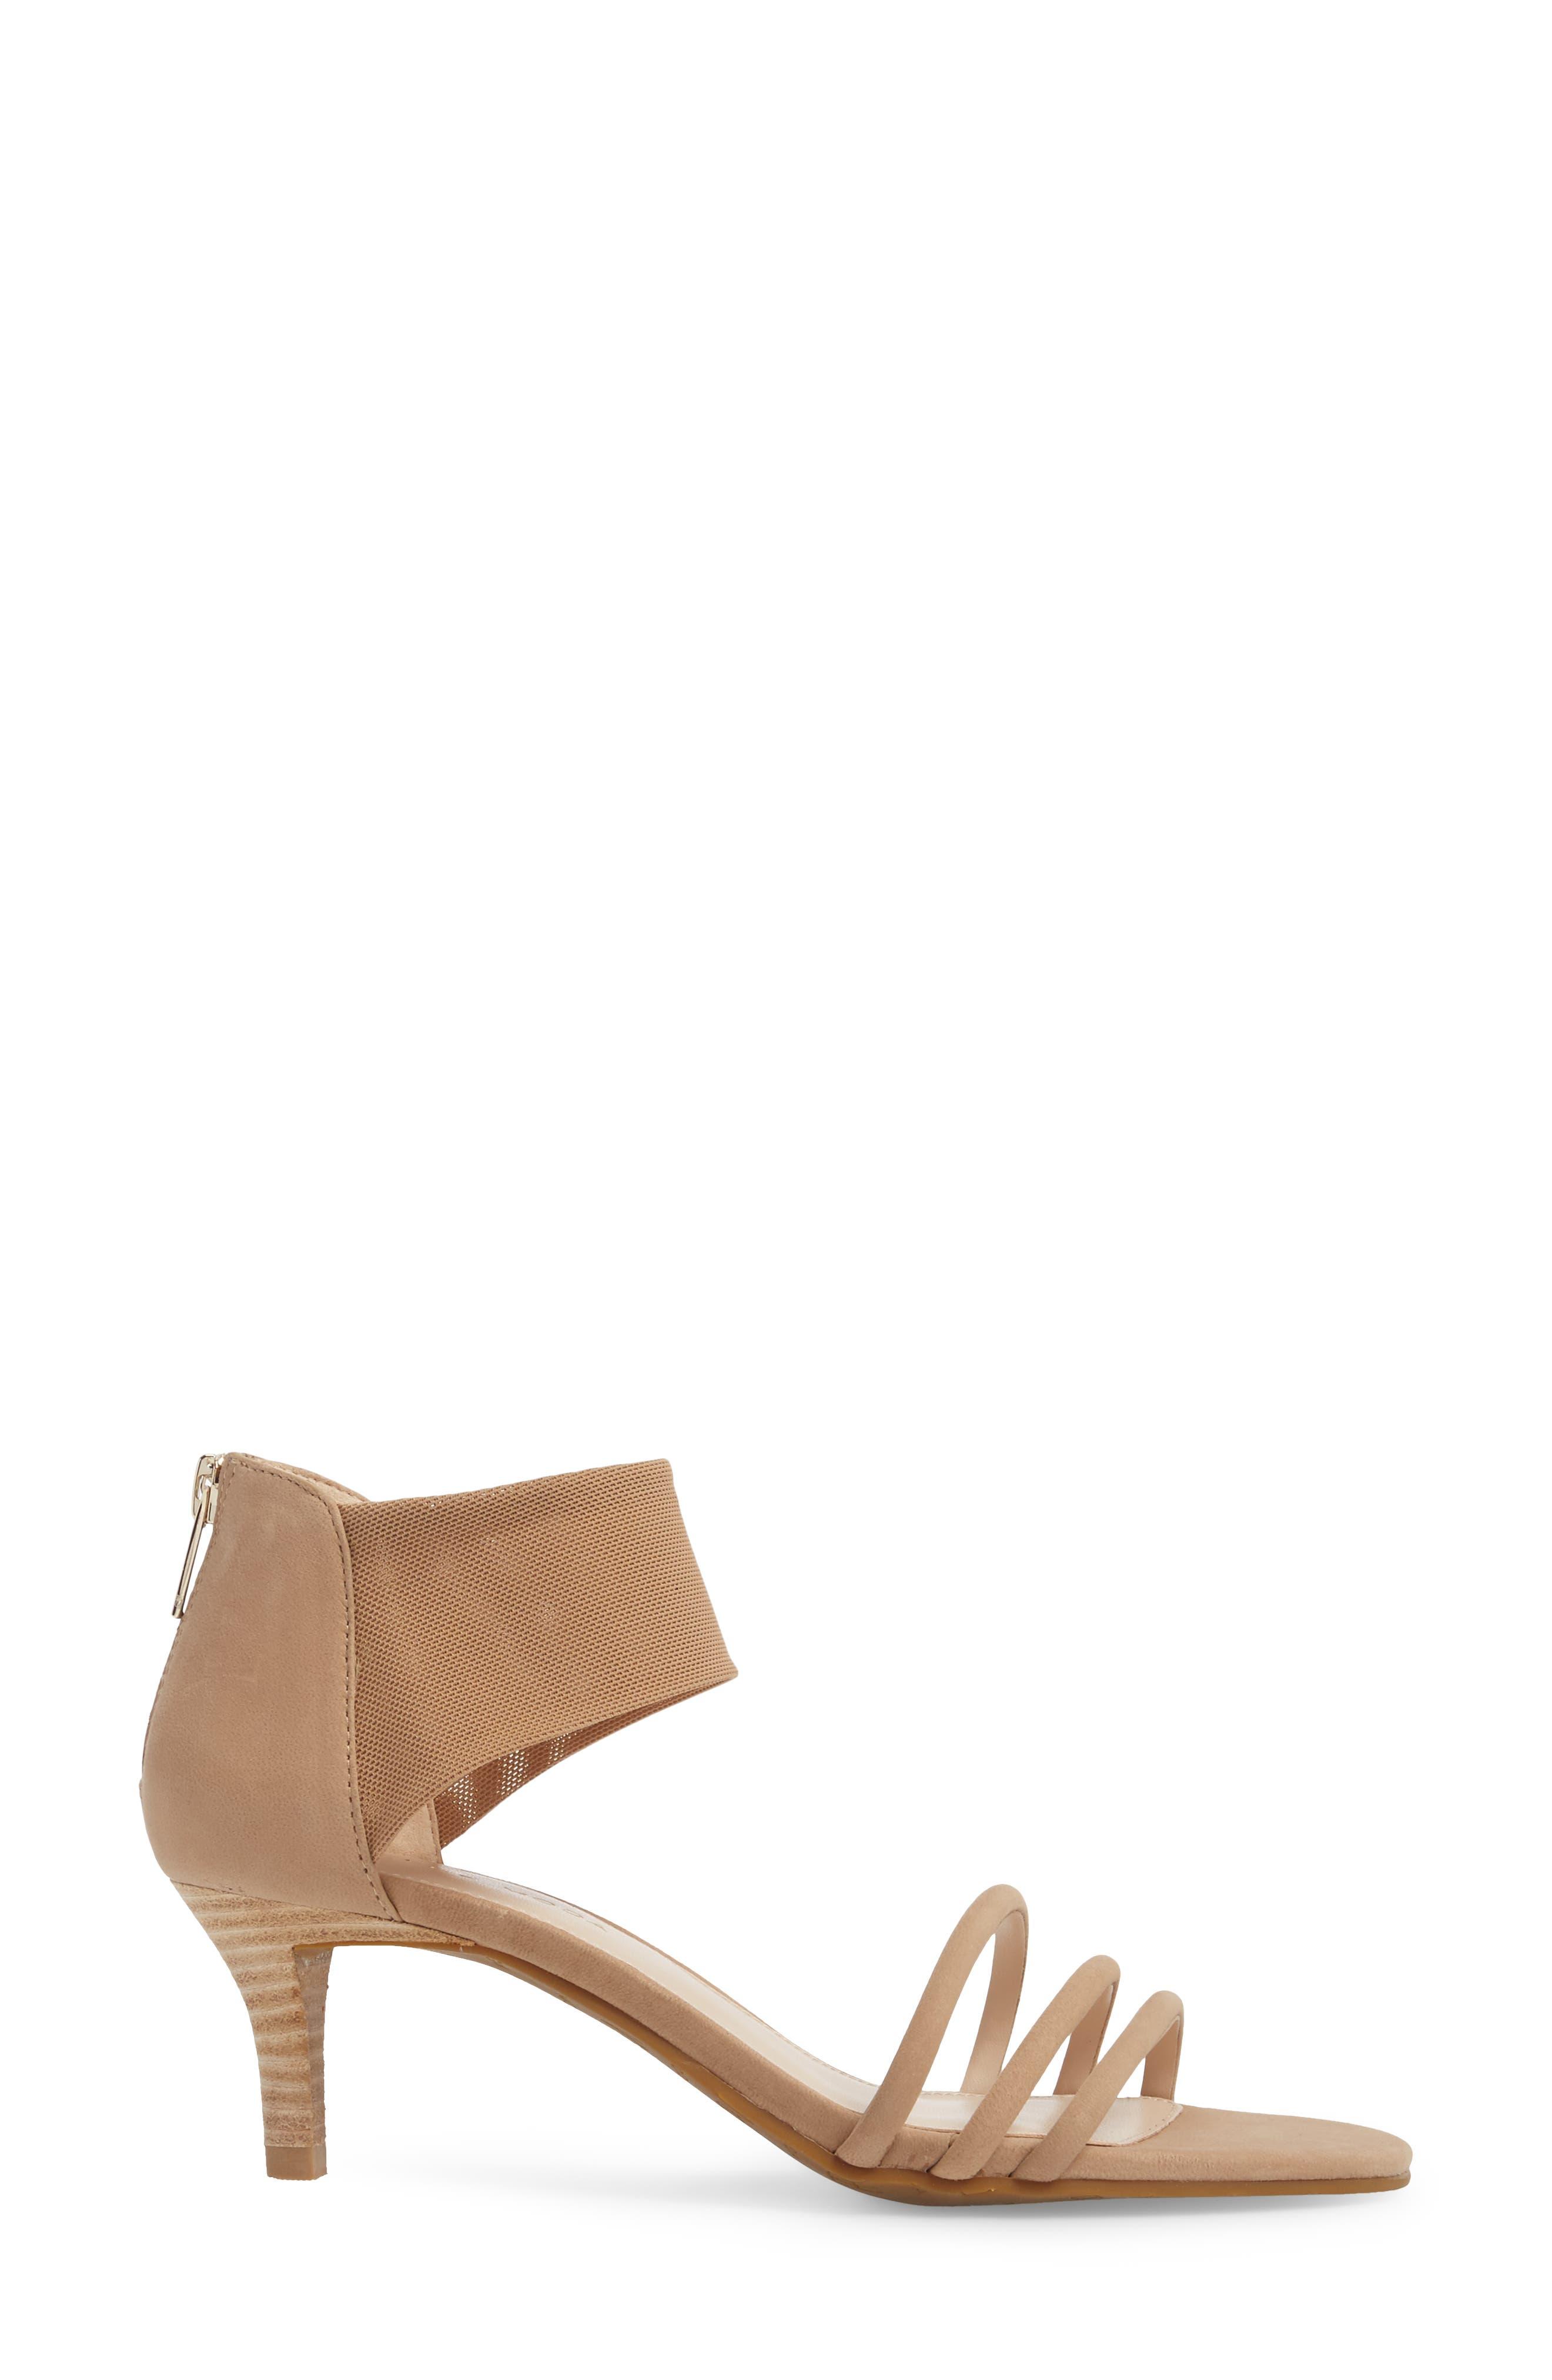 Berri Ankle Cuff Sandal,                             Alternate thumbnail 8, color,